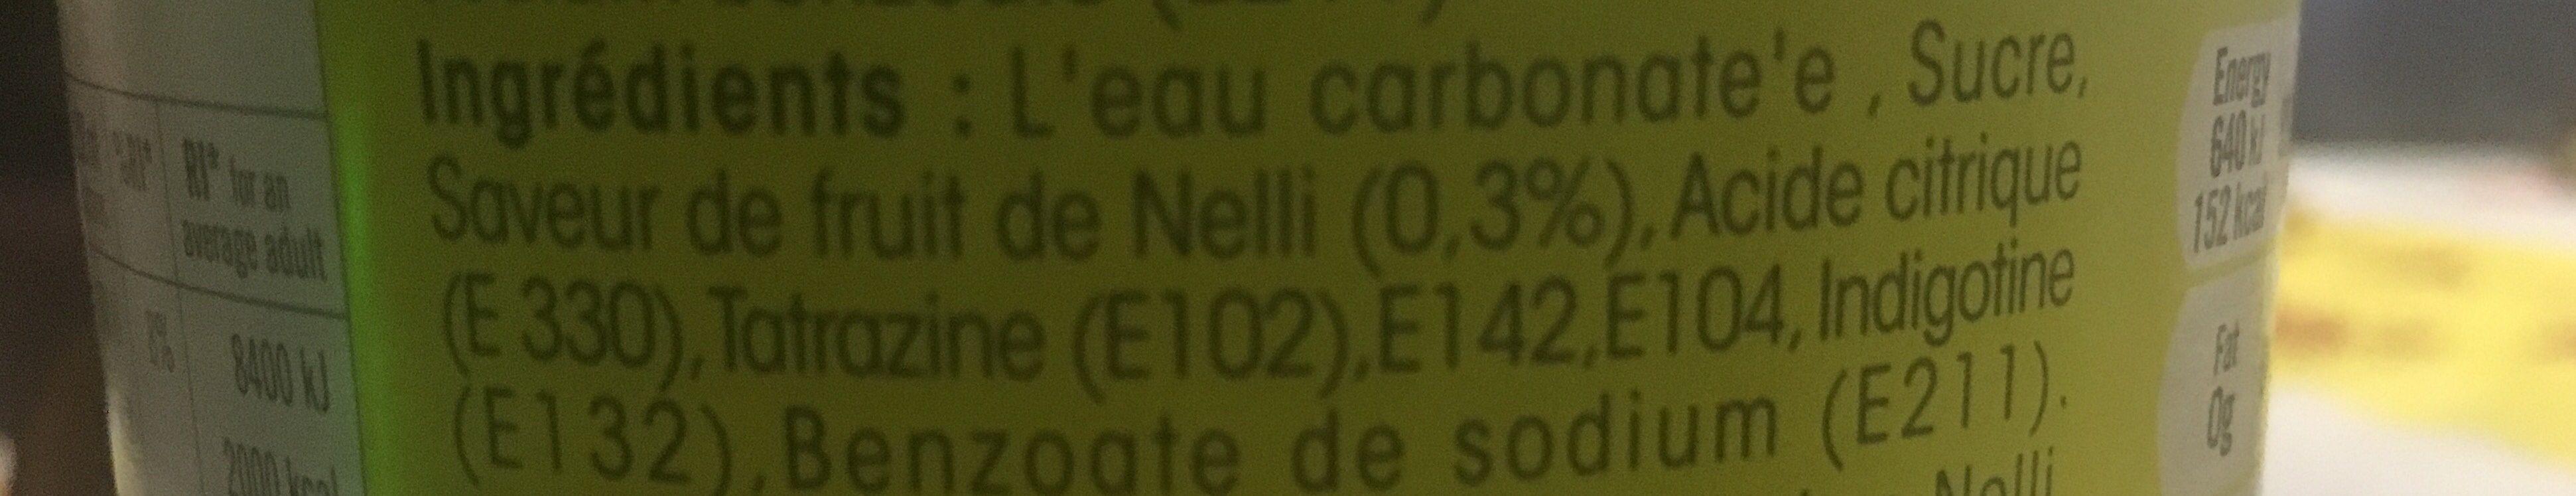 Niru Nelli Amla Flavour Drink Ltr - Ingrédients - fr